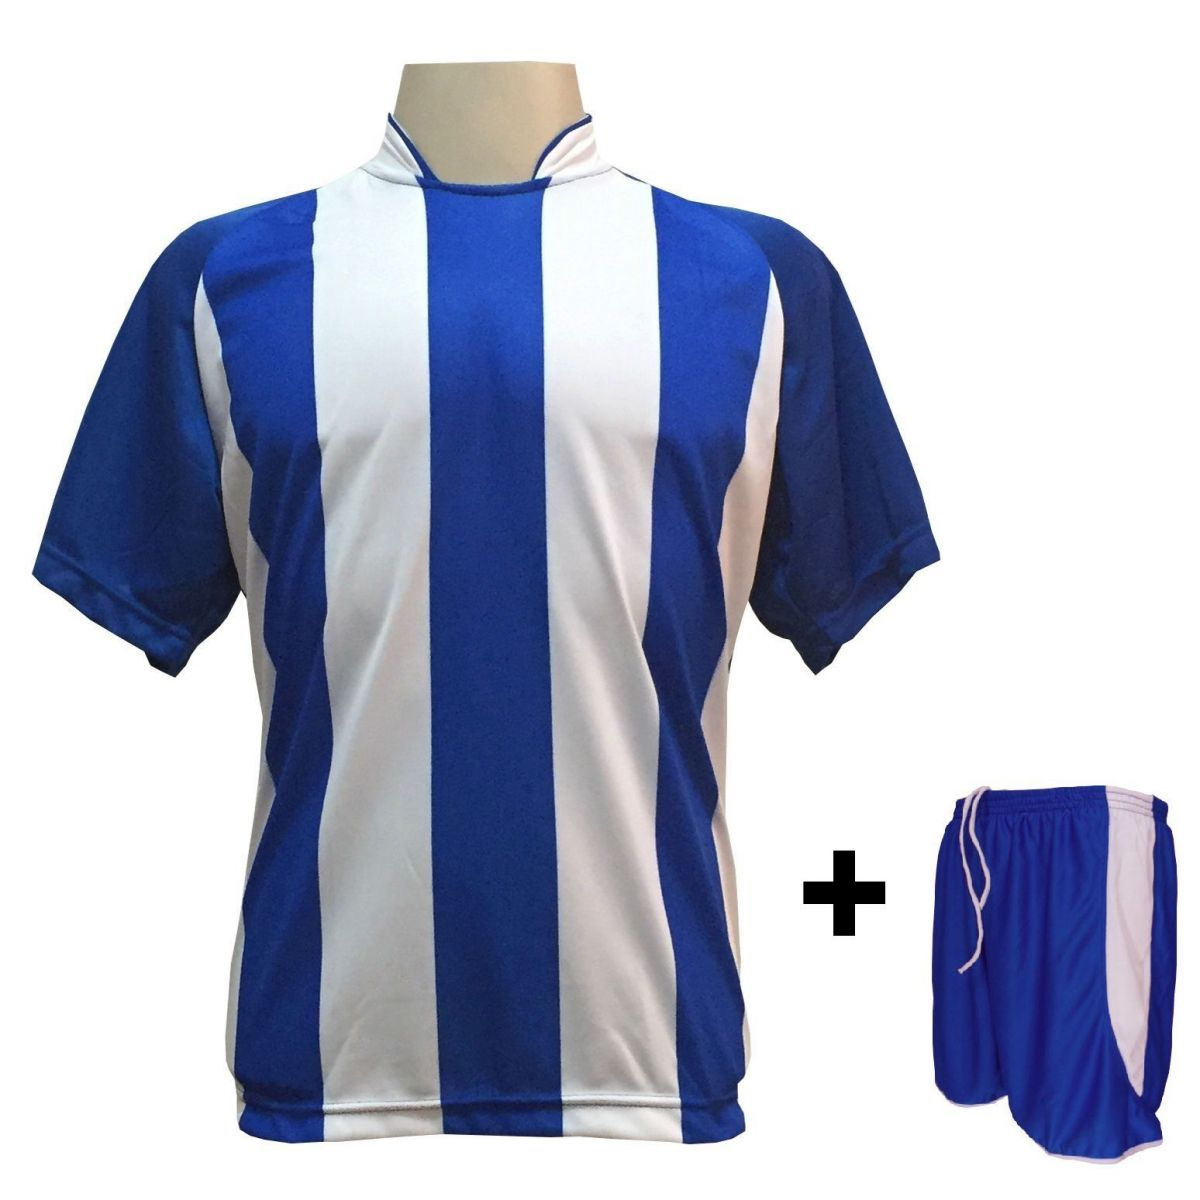 Uniforme Esportivo com 12 Camisas modelo Milan Royal/Branco + 12 Calções modelo Copa Royal/Branco